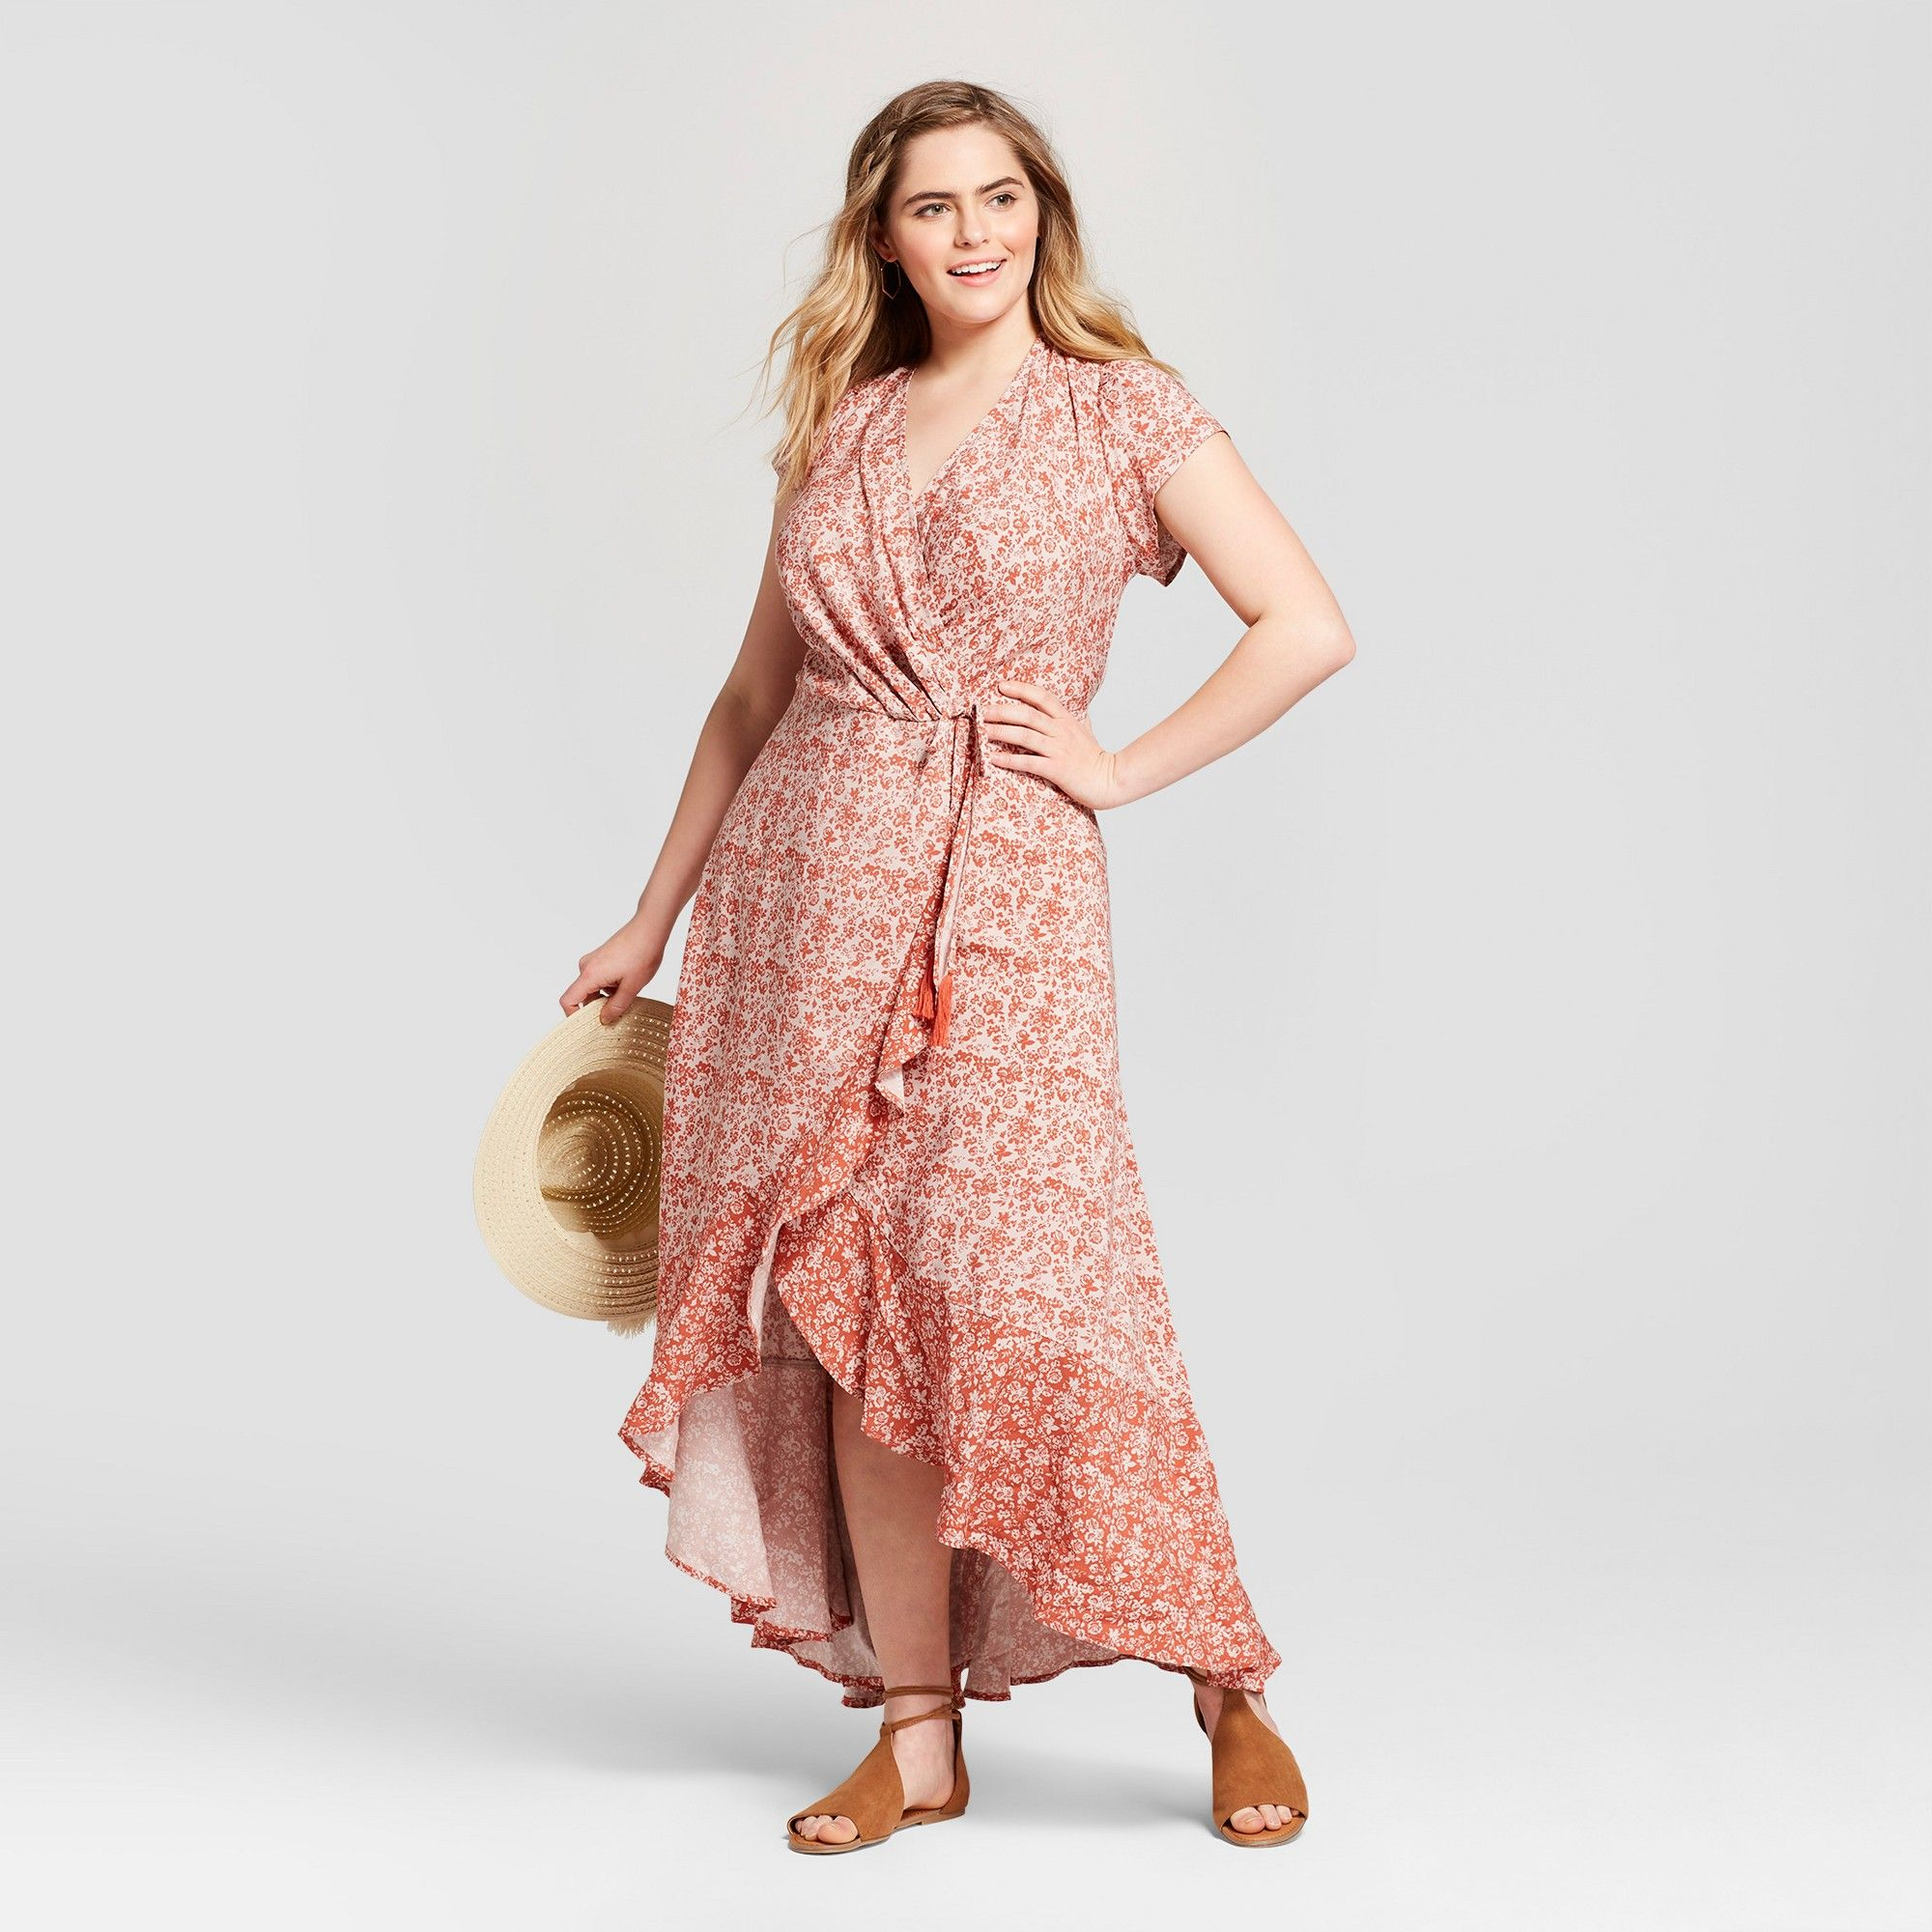 cfe28ec9b364a Women's Plus Size Floral Print V-Neck Maxi Dress - Xhilaration Pink ...